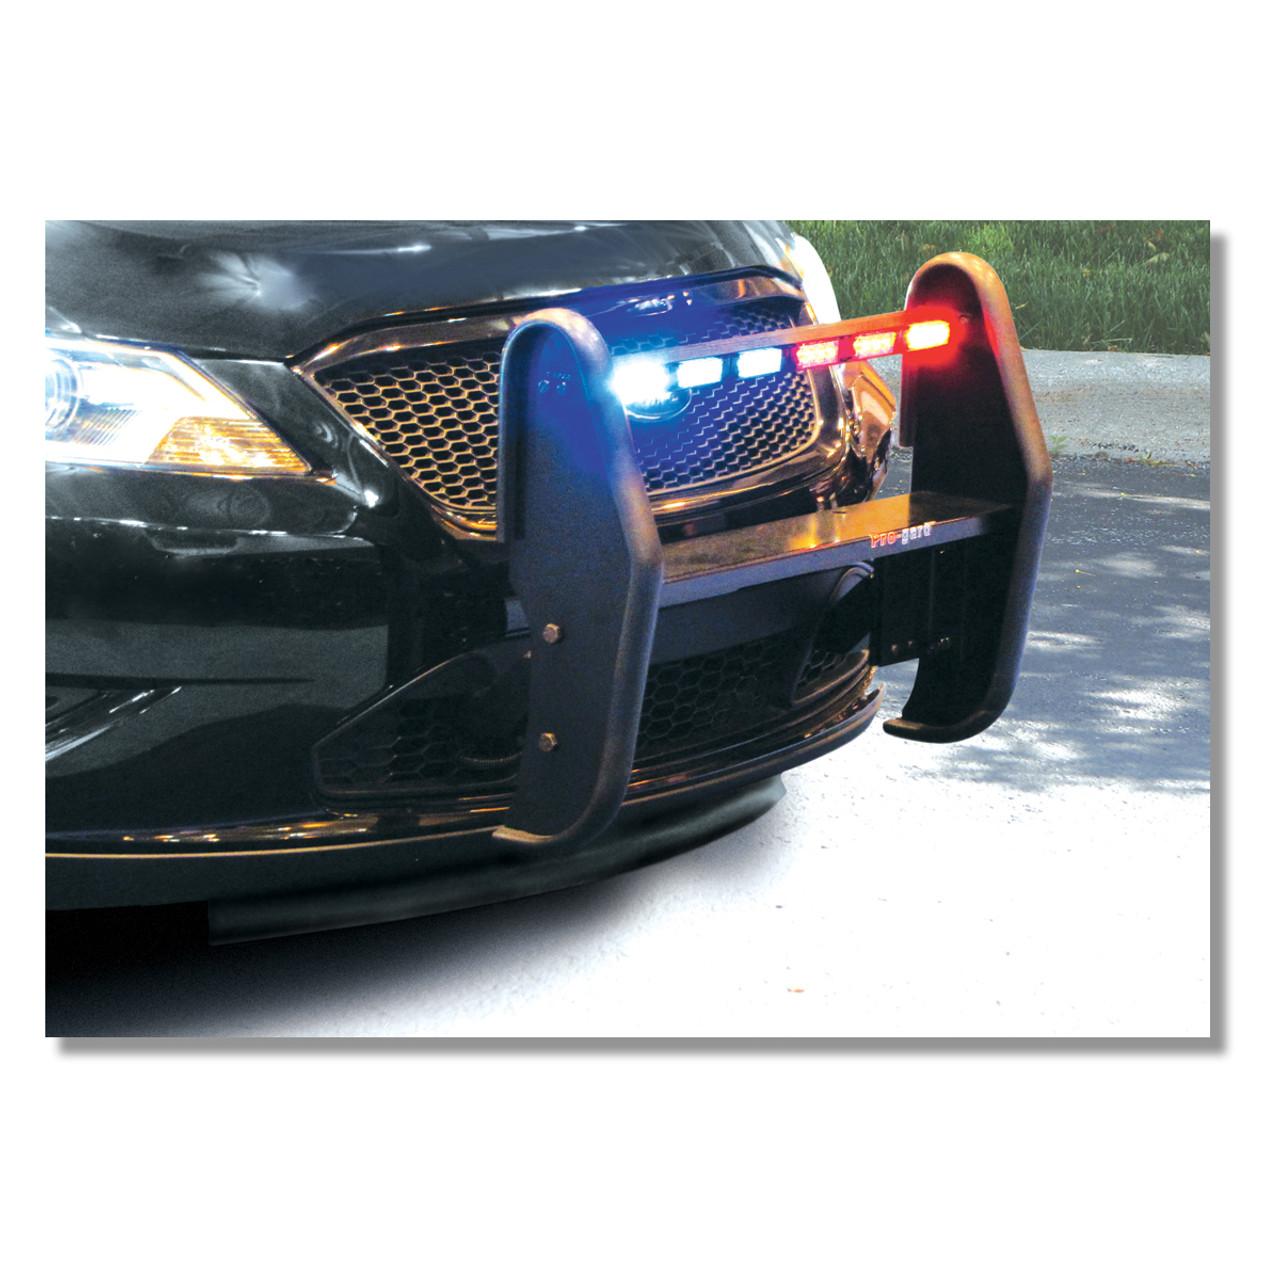 Police Interceptor Sedan Push Bumper Grill Guard by Progard, 2013-2019